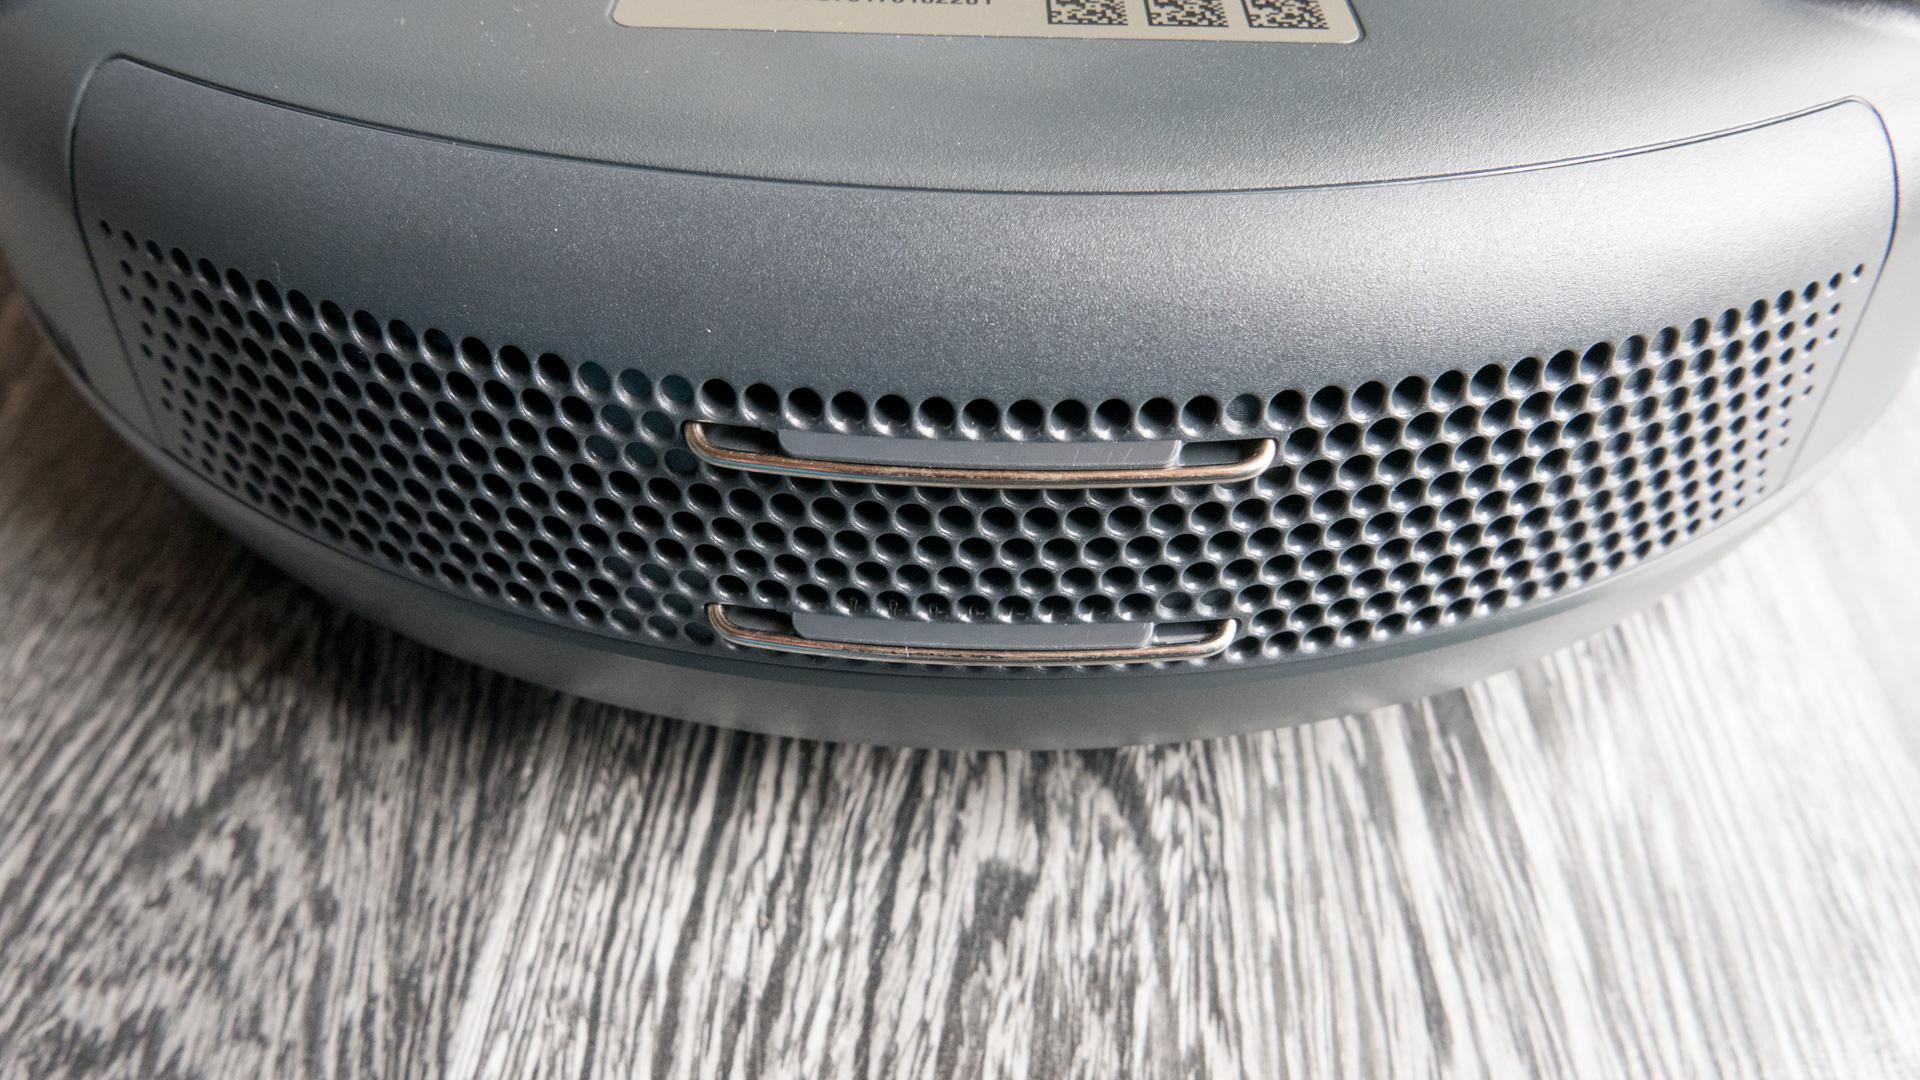 Vorwerk VR200 Details 33